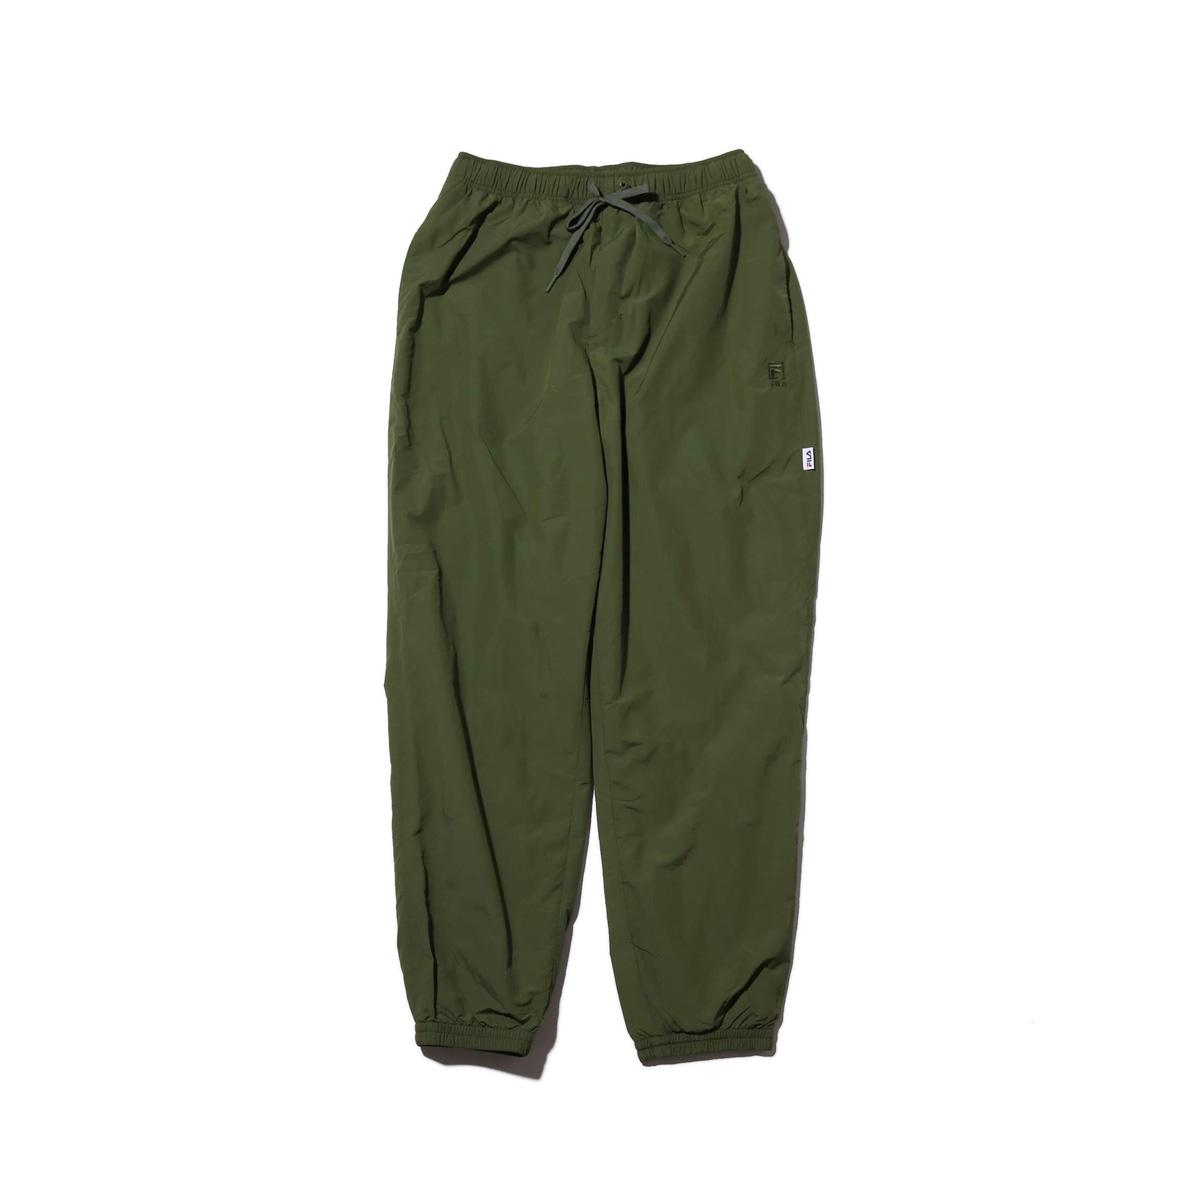 FILA Easy long pants (フィラ イージー ロング パンツ)KHAKI【メンズ パンツ】18FW-I